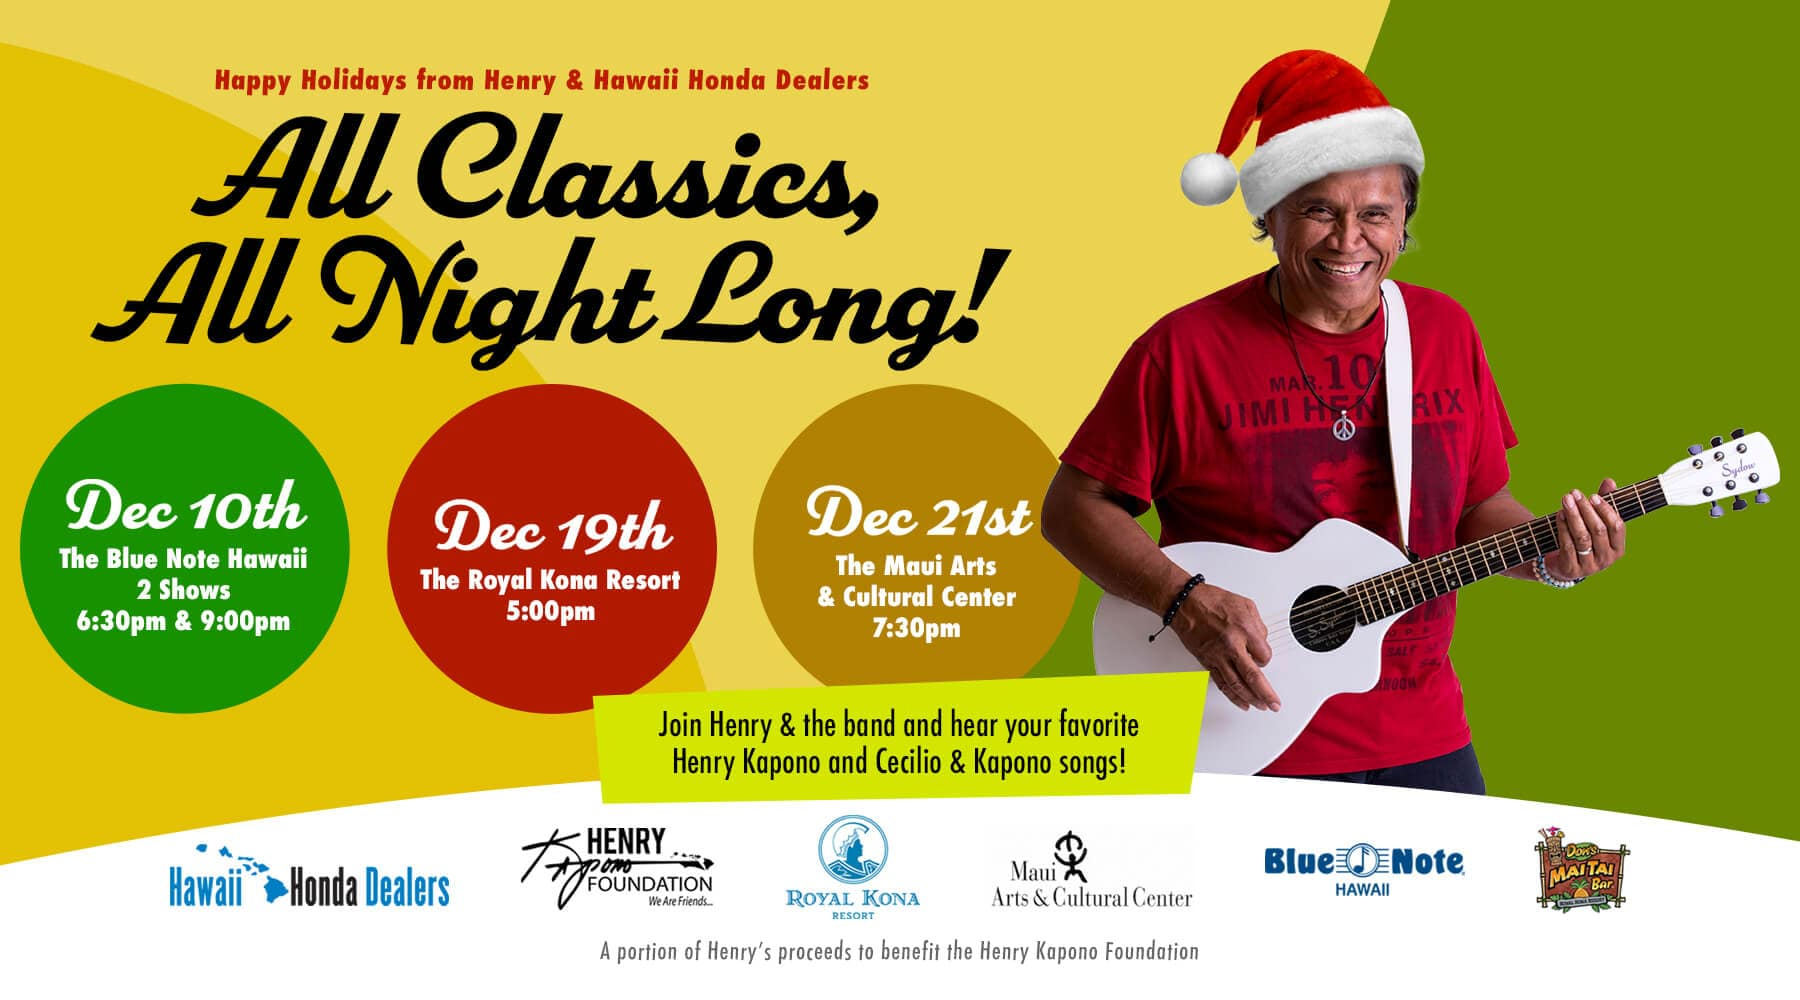 Henry Kapono Holiday Events HP Slide